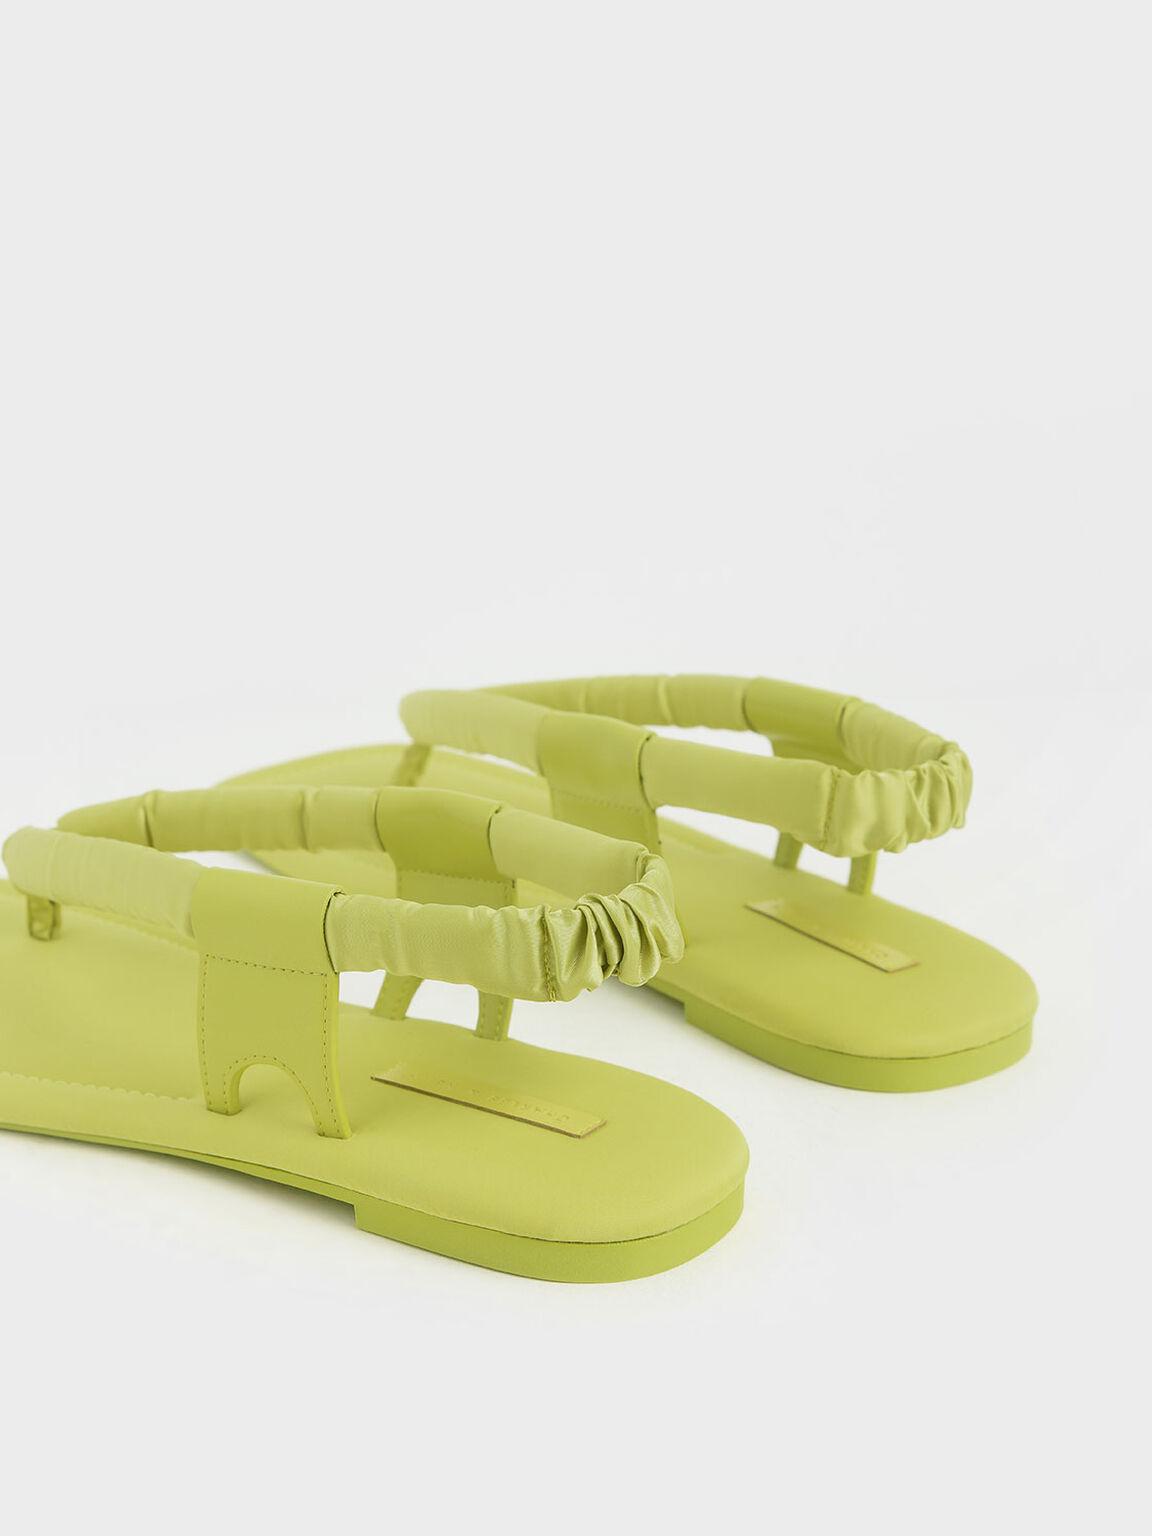 Puffy Strap Thong Sandals, Green, hi-res